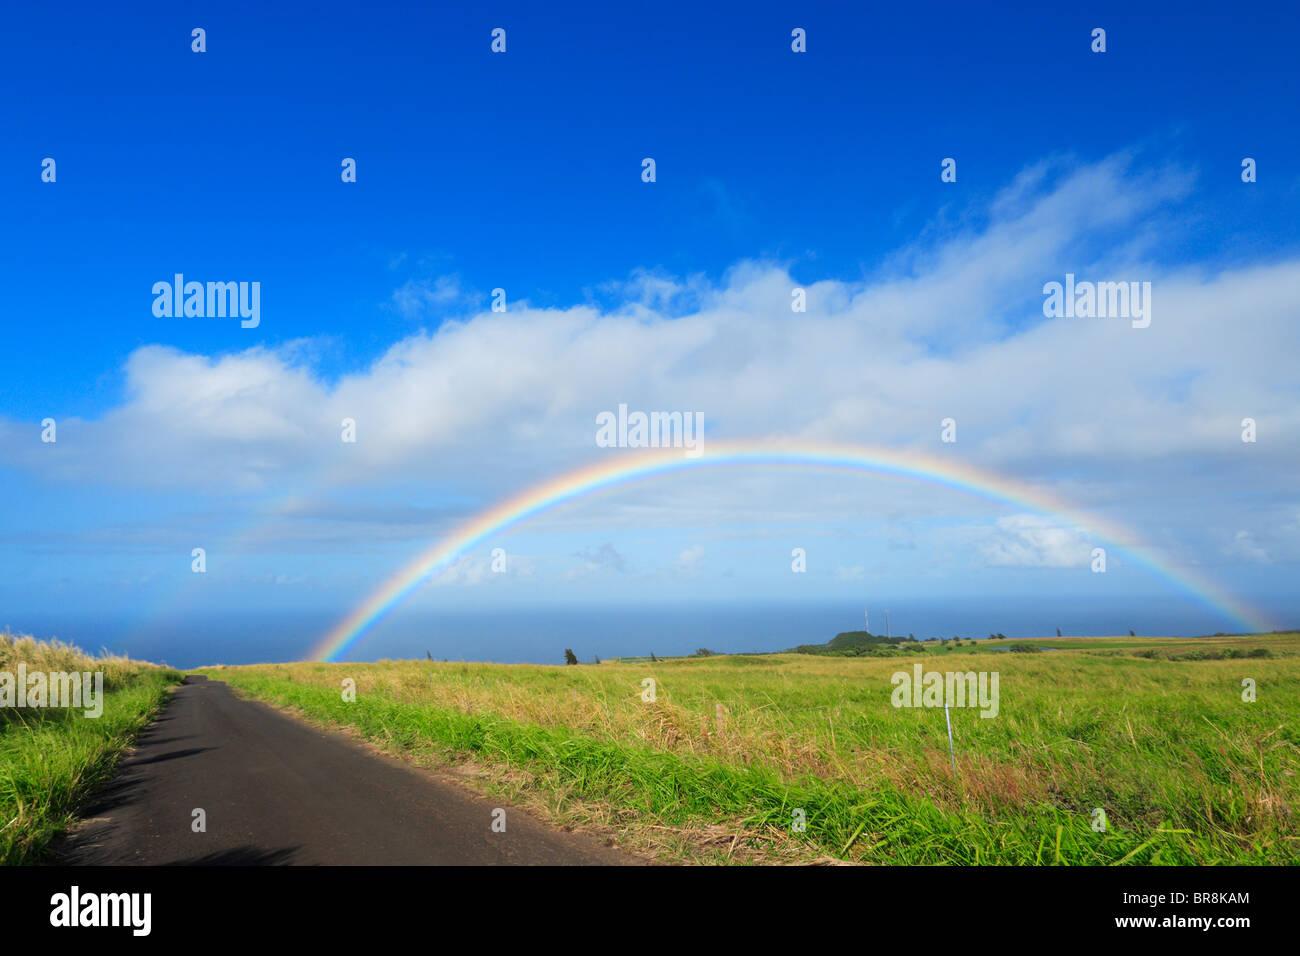 Arc-en-ciel sur Champ, Hawaii, USA Banque D'Images